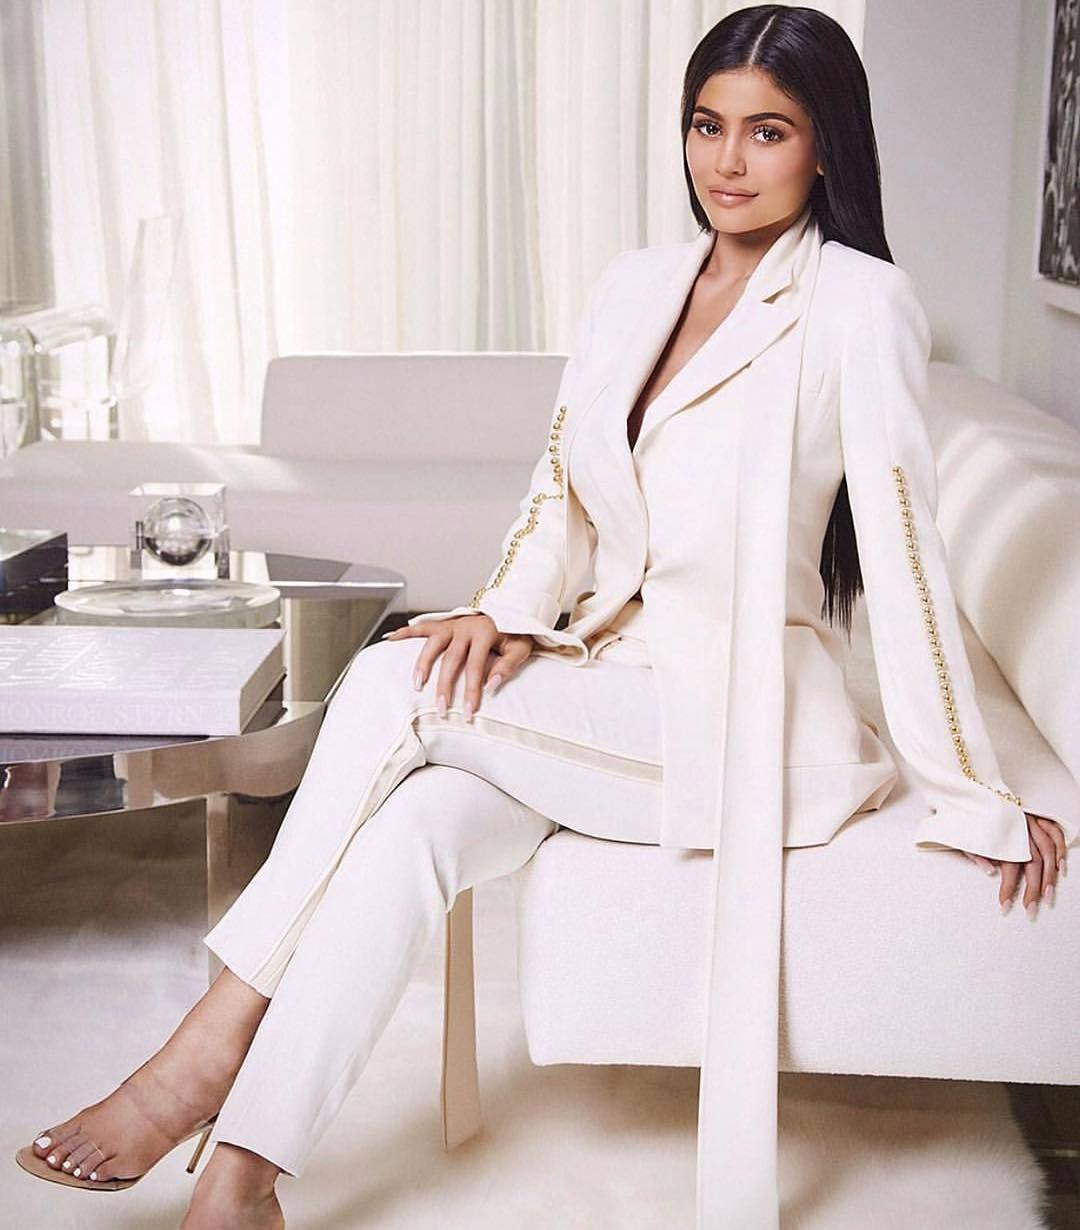 Traje pantalón-chaqueta, por Kylie Jenner